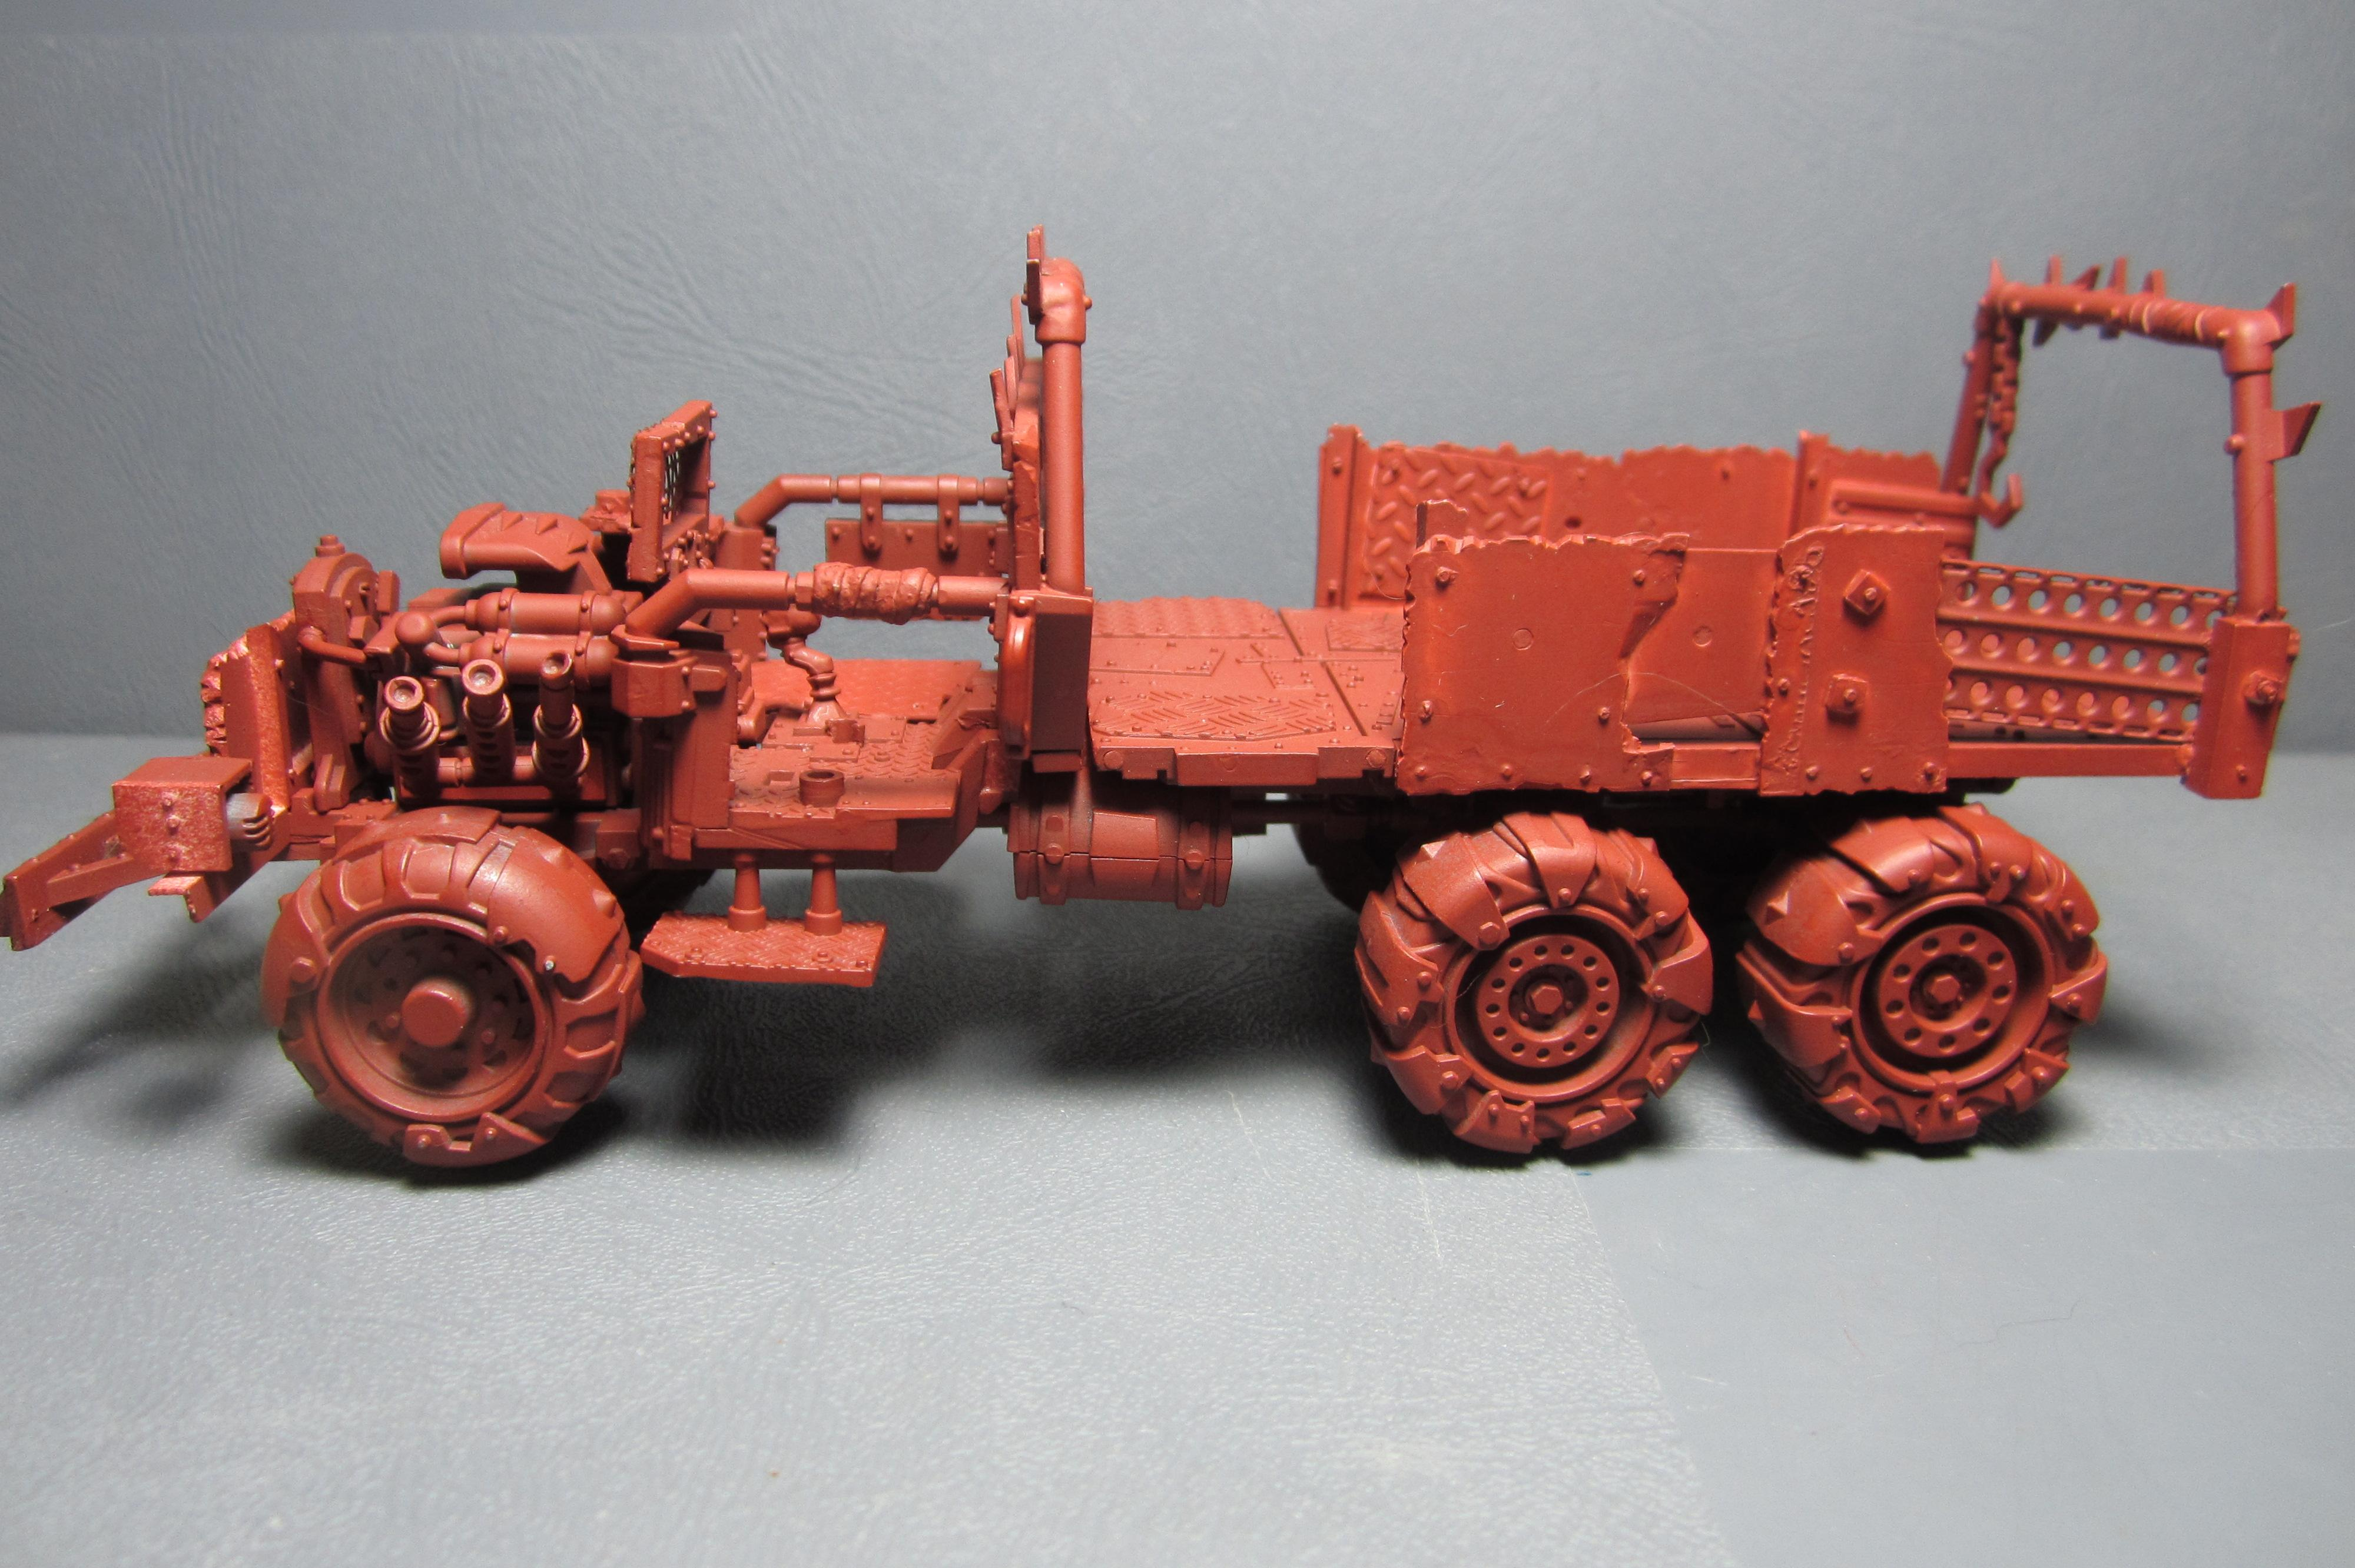 Conversion, Gorka Morka, Ork Trukk, Orks, Vehicle, Warhammer 40,000